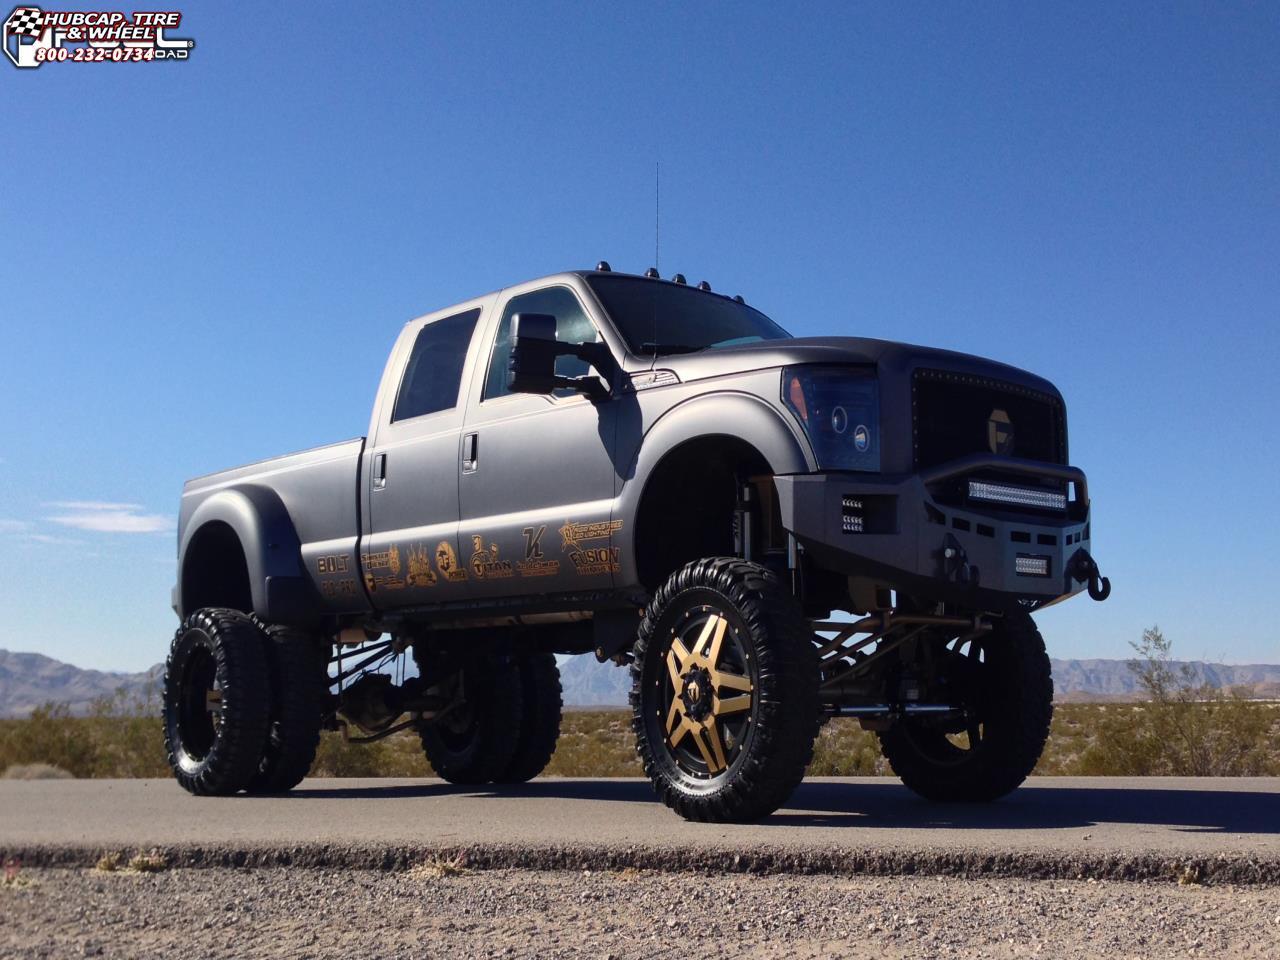 Ford Dually Rims >> Ford F-350 Dually Fuel Full Blown Dually Rear D254 Wheels Custom